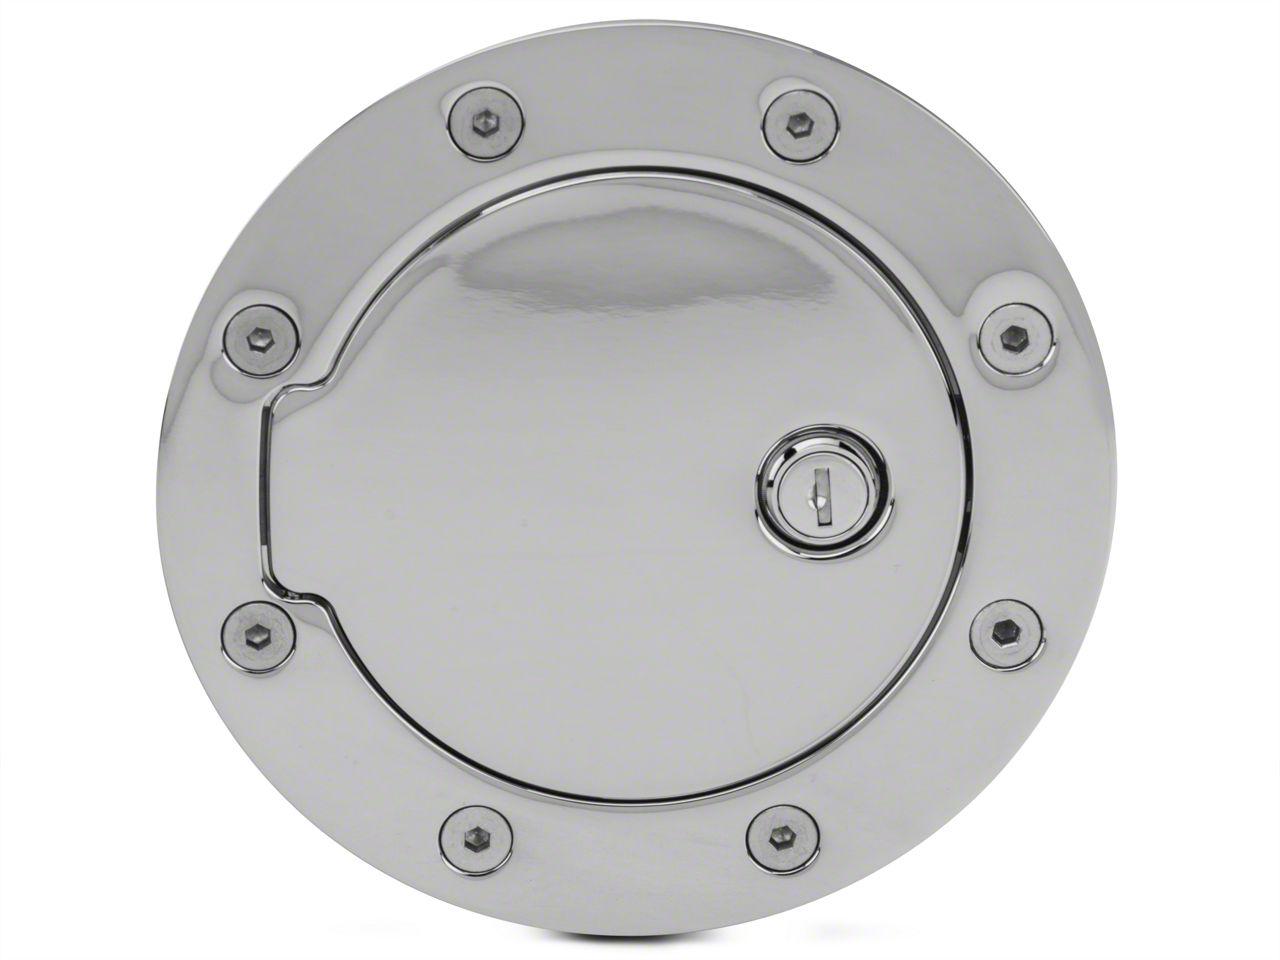 Modern Billet Race Style Billet Locking Fuel Door - Chrome (97-03 F-150)